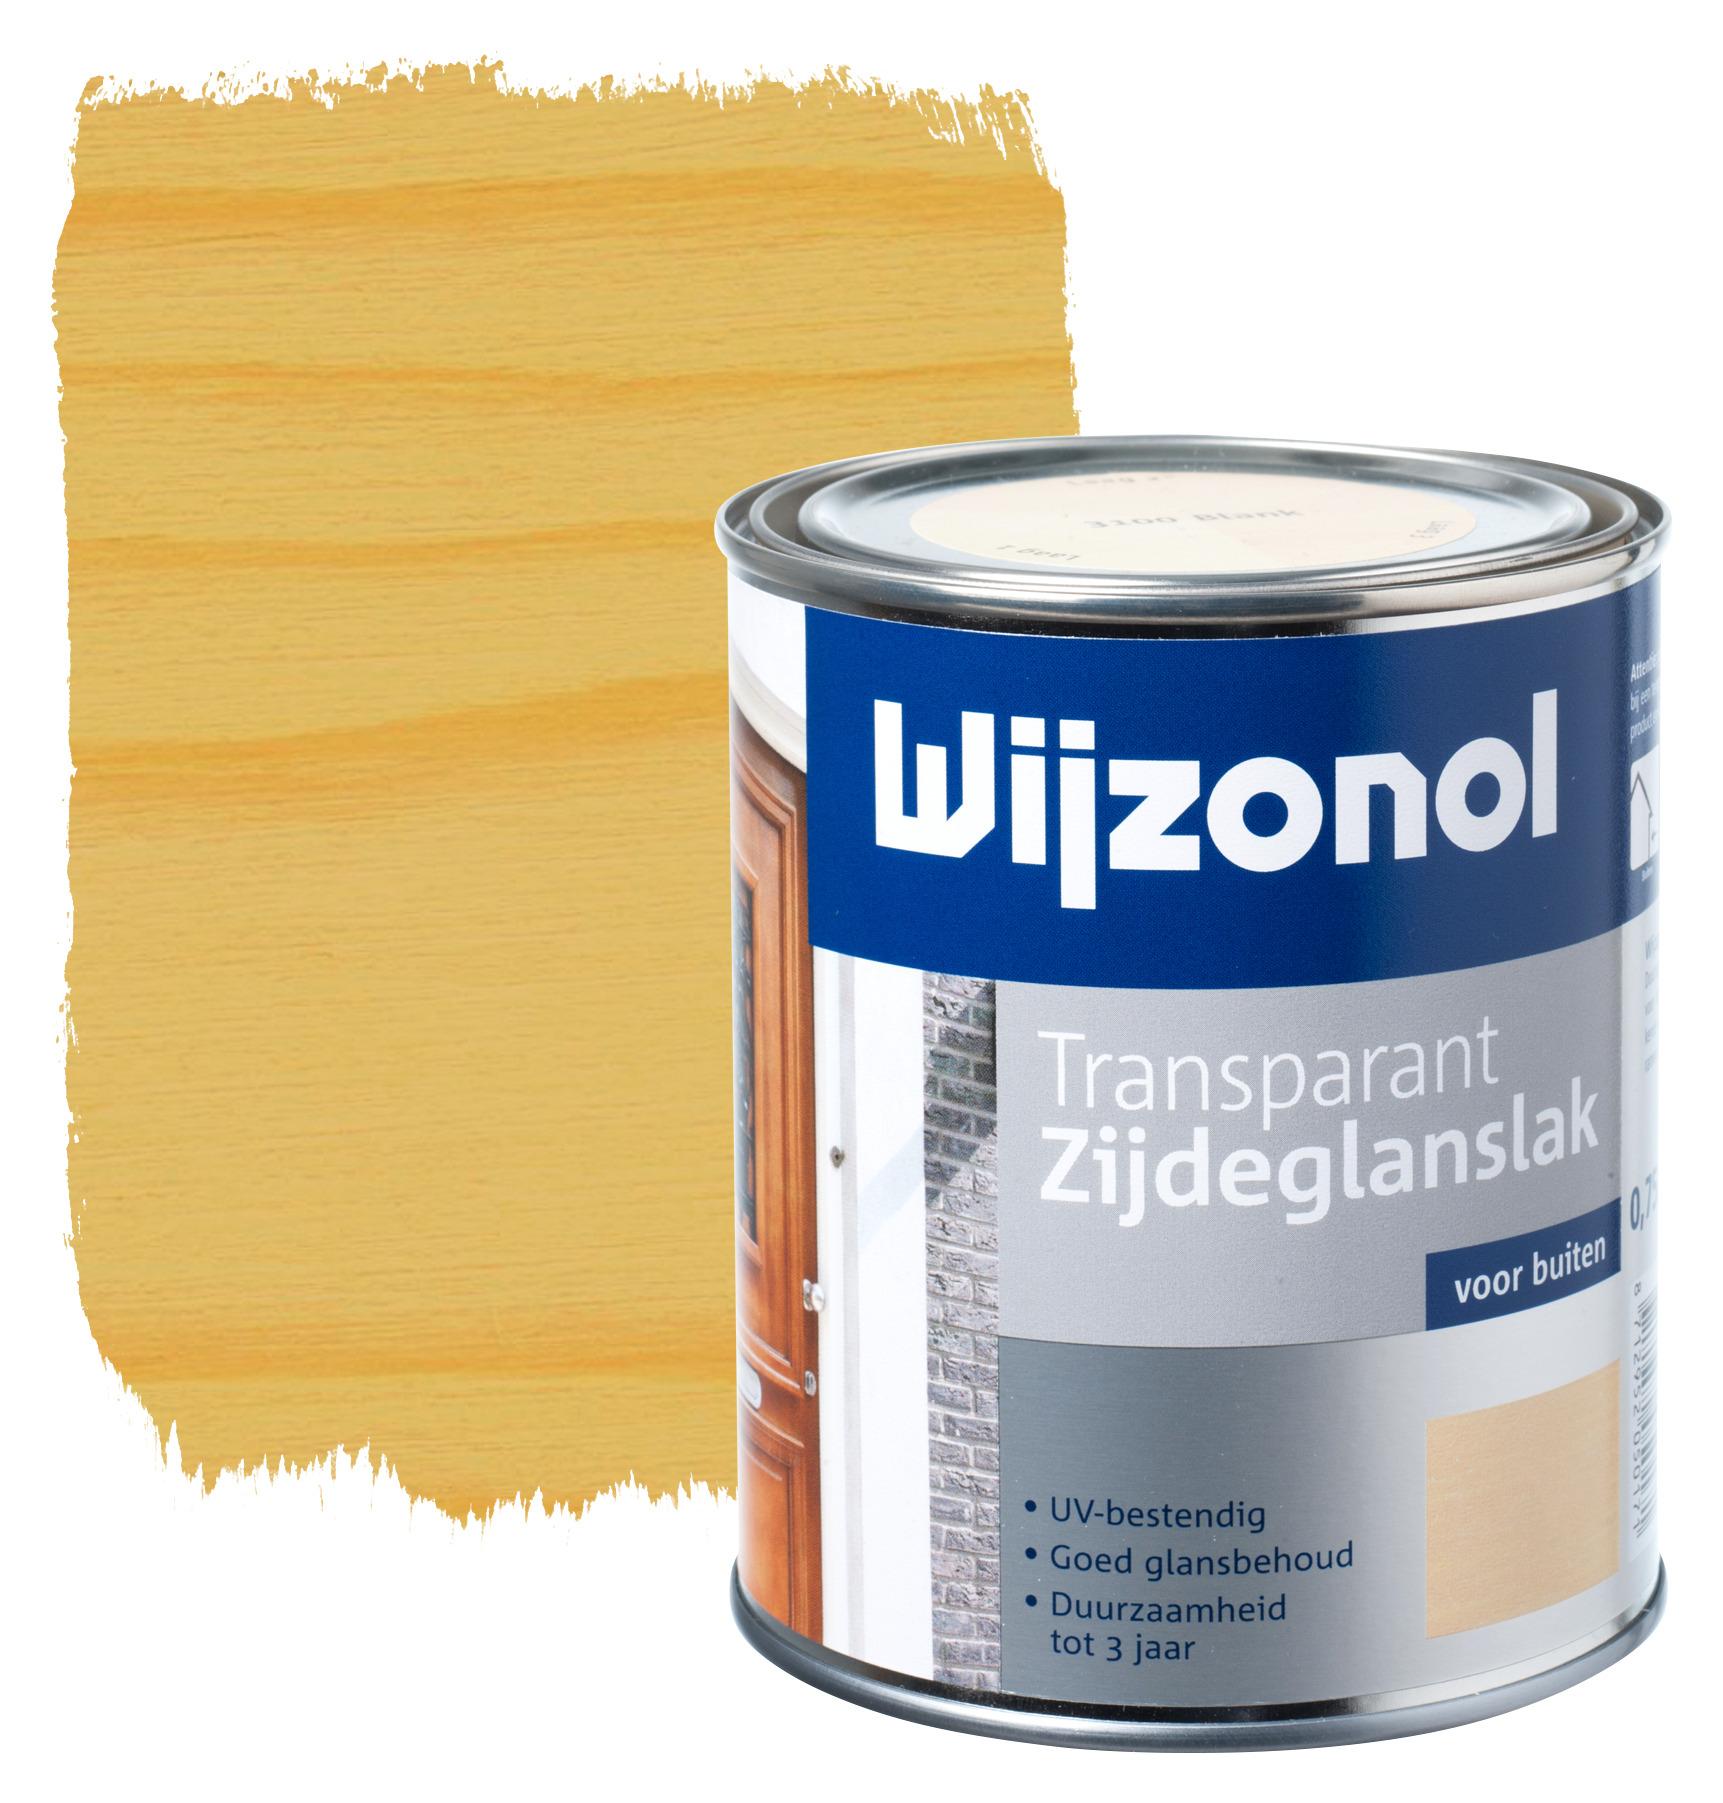 Wijzonol rm buitenverf zijdeglans transparant alkyd blank 3100 750 ml